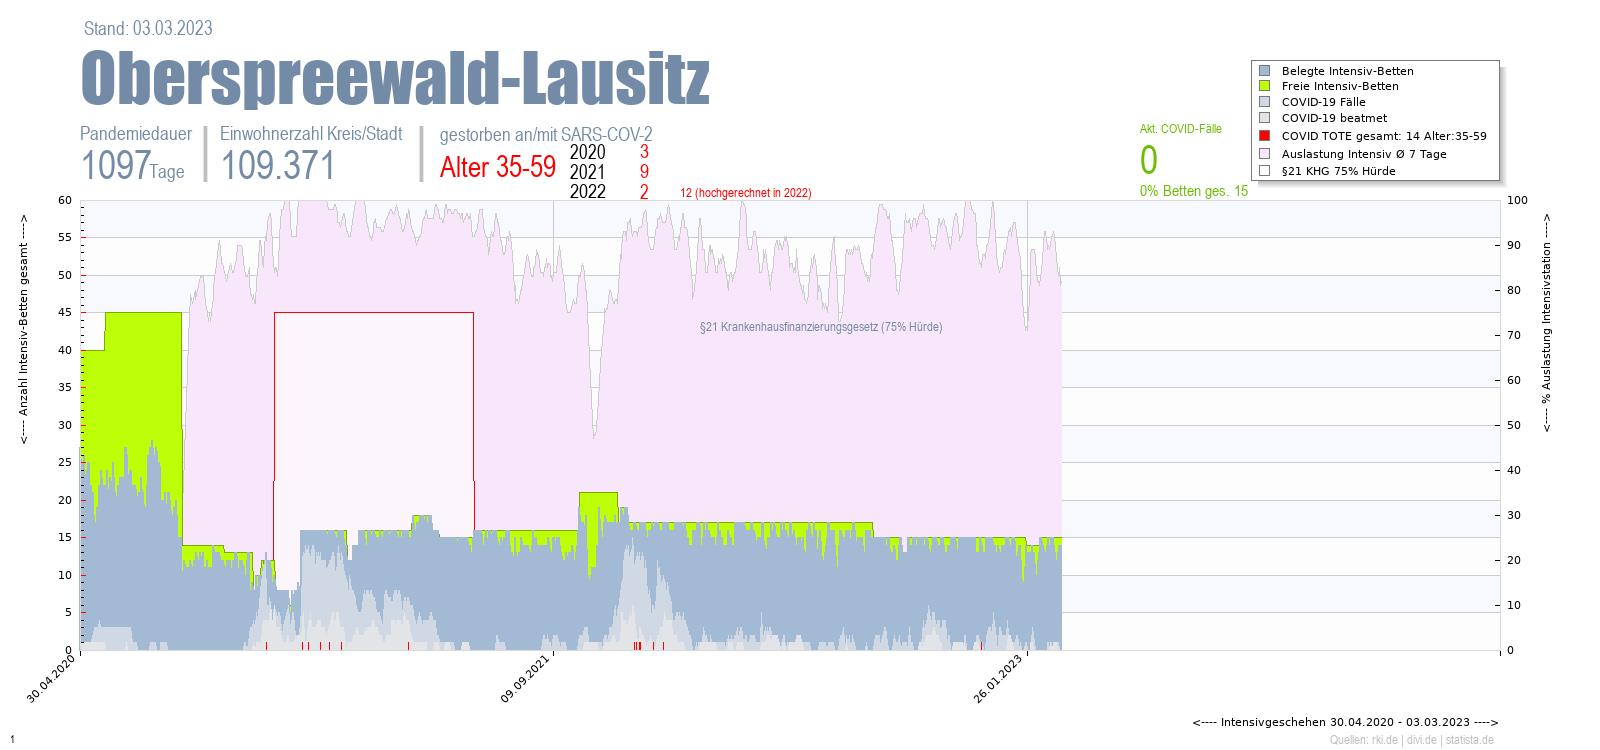 Intensivstation Auslastung Oberspreewald-Lausitz Alter 0-4